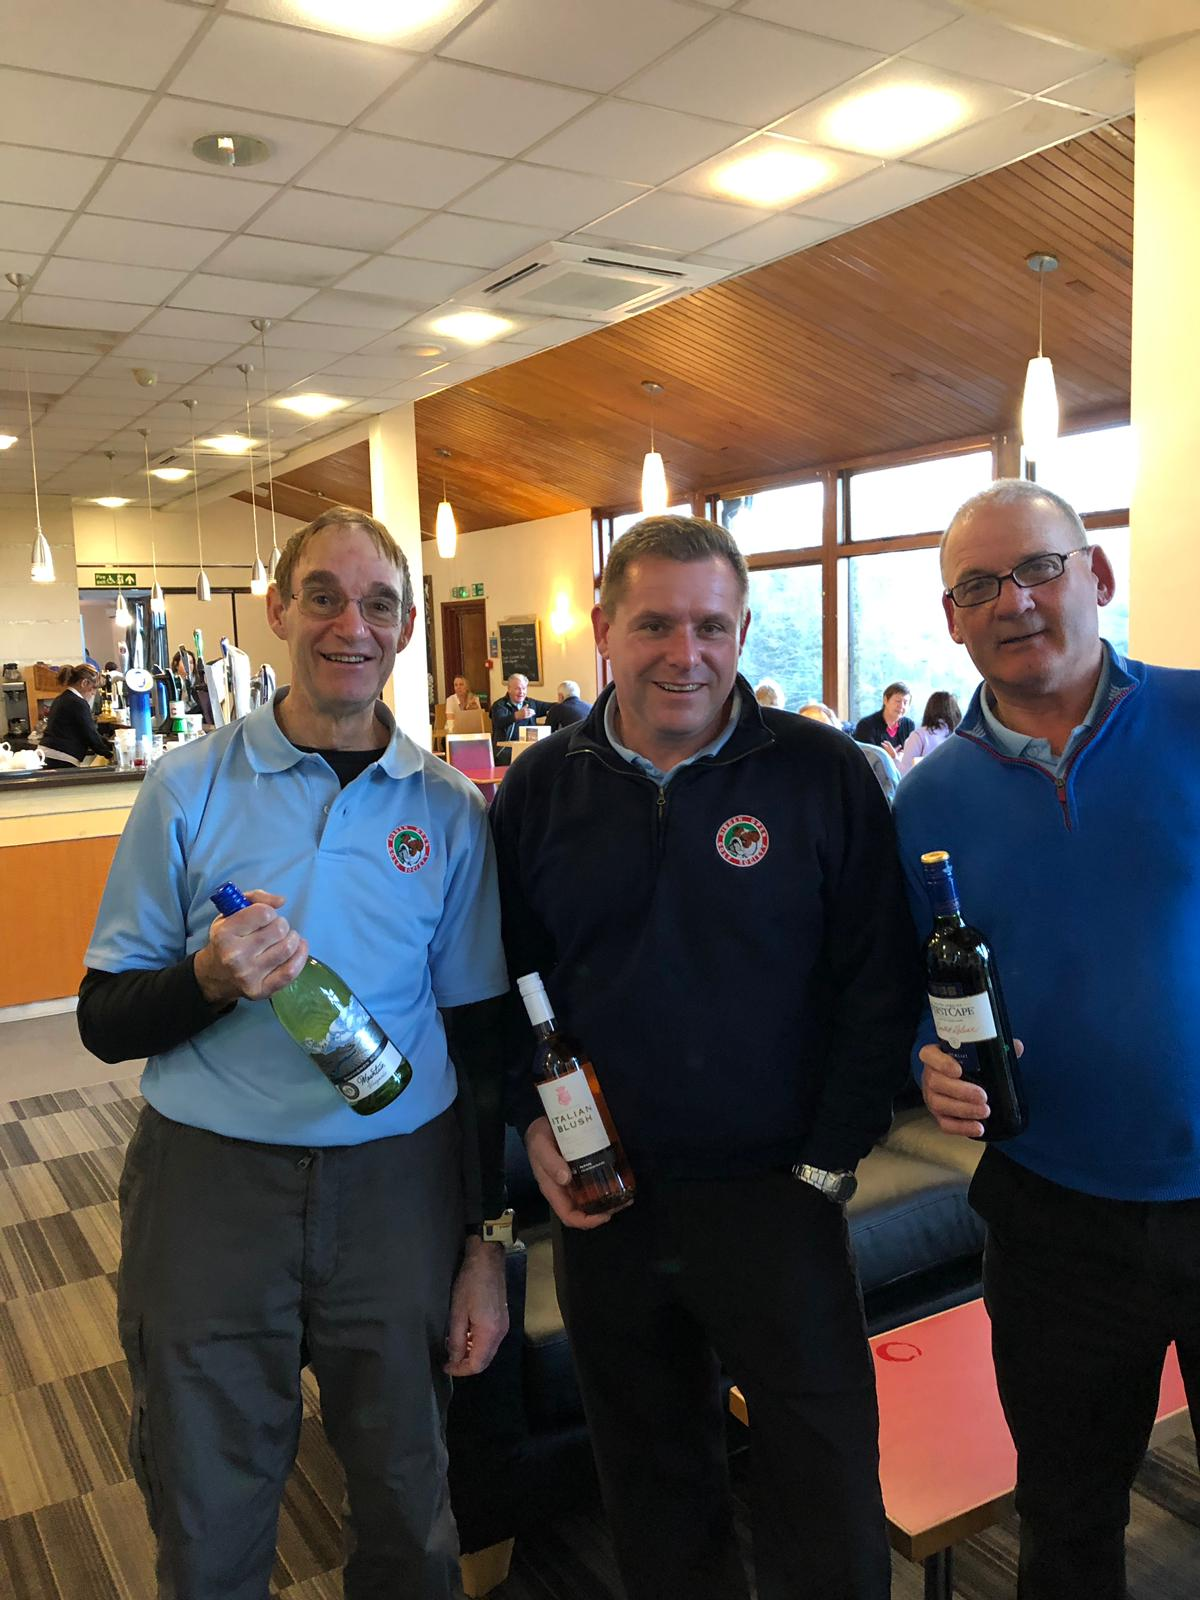 8 Jan. Wine winners L to R: R James; P Mortimer; K Maton